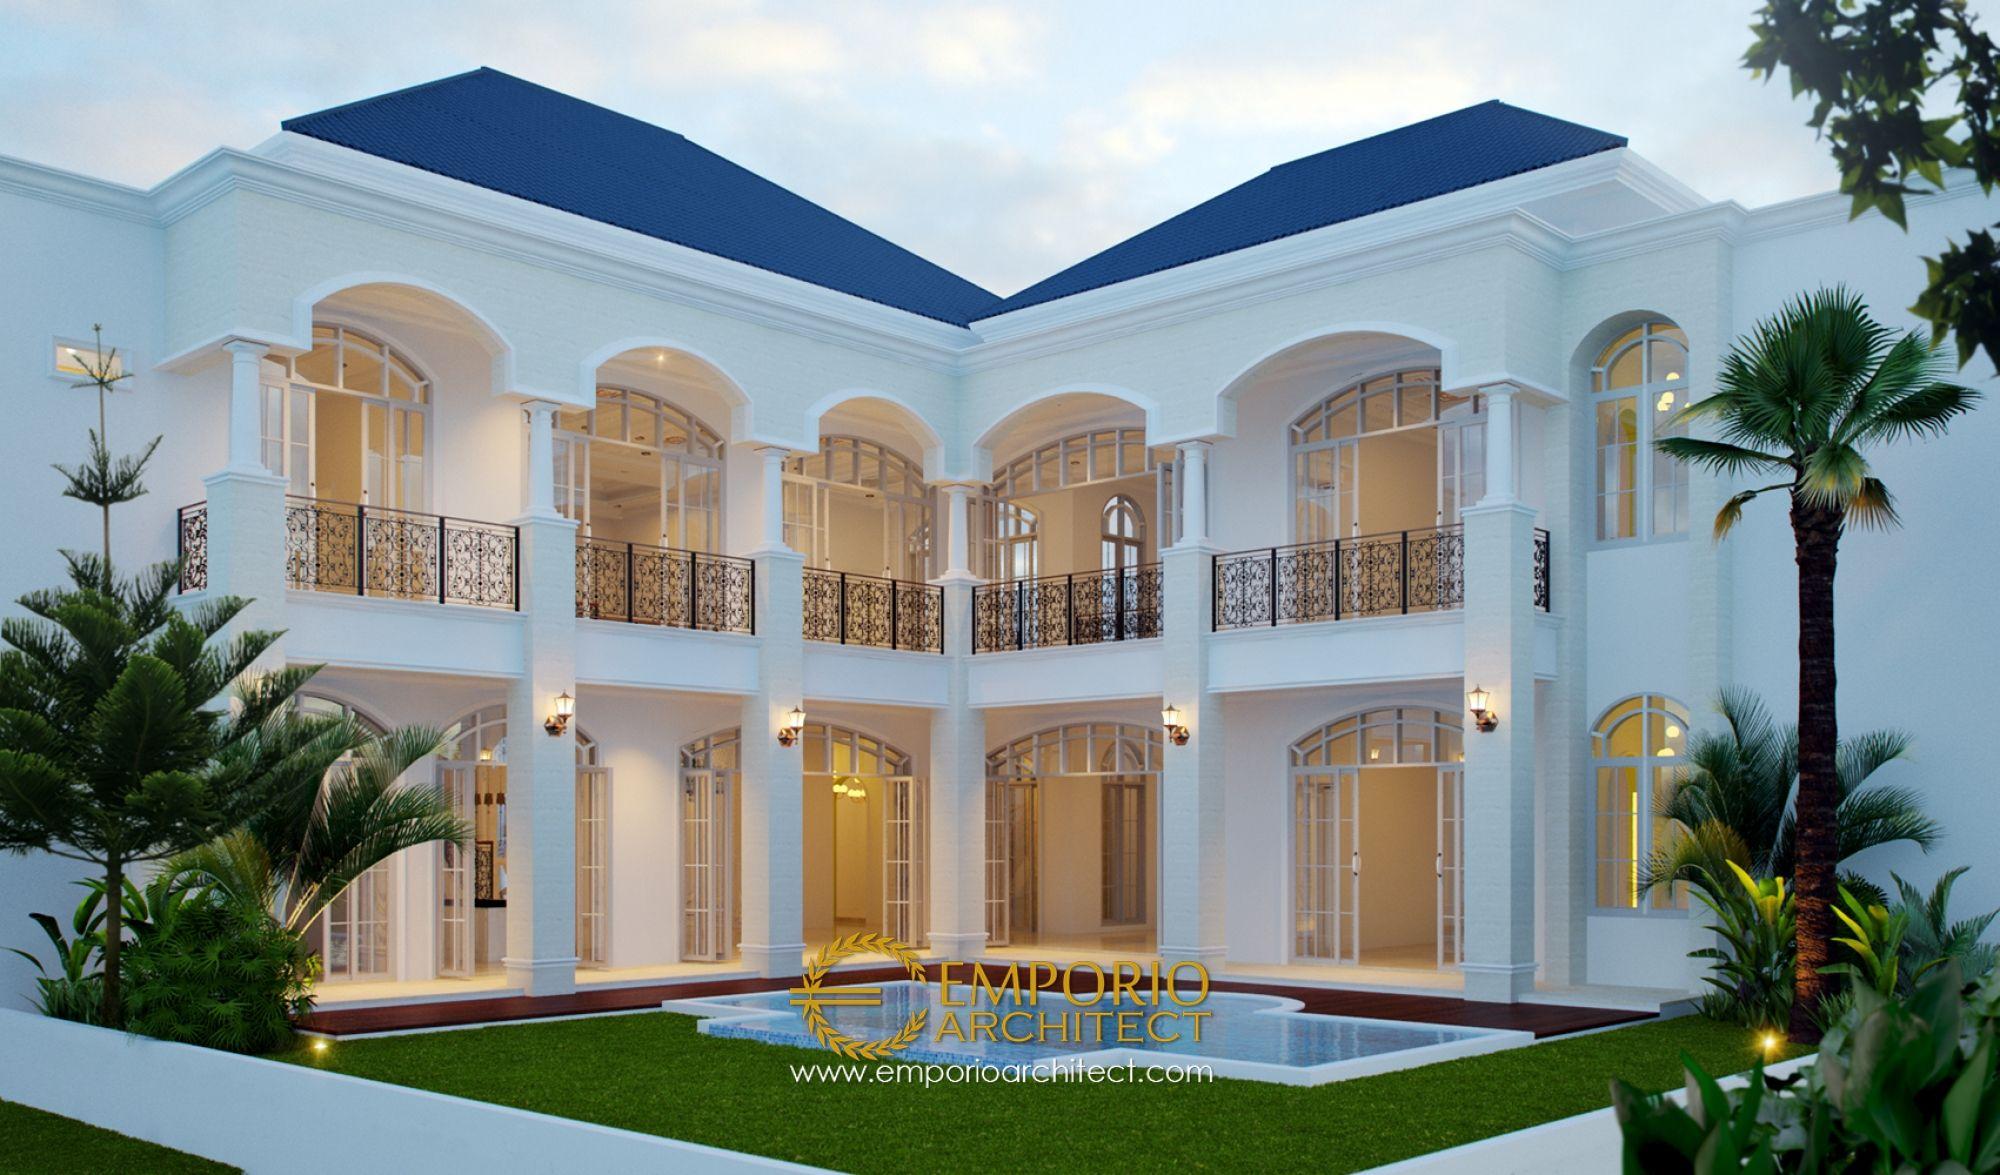 Jasa Arsitek Semarang, Jawa Tengah Desain Rumah Ibu Yanti